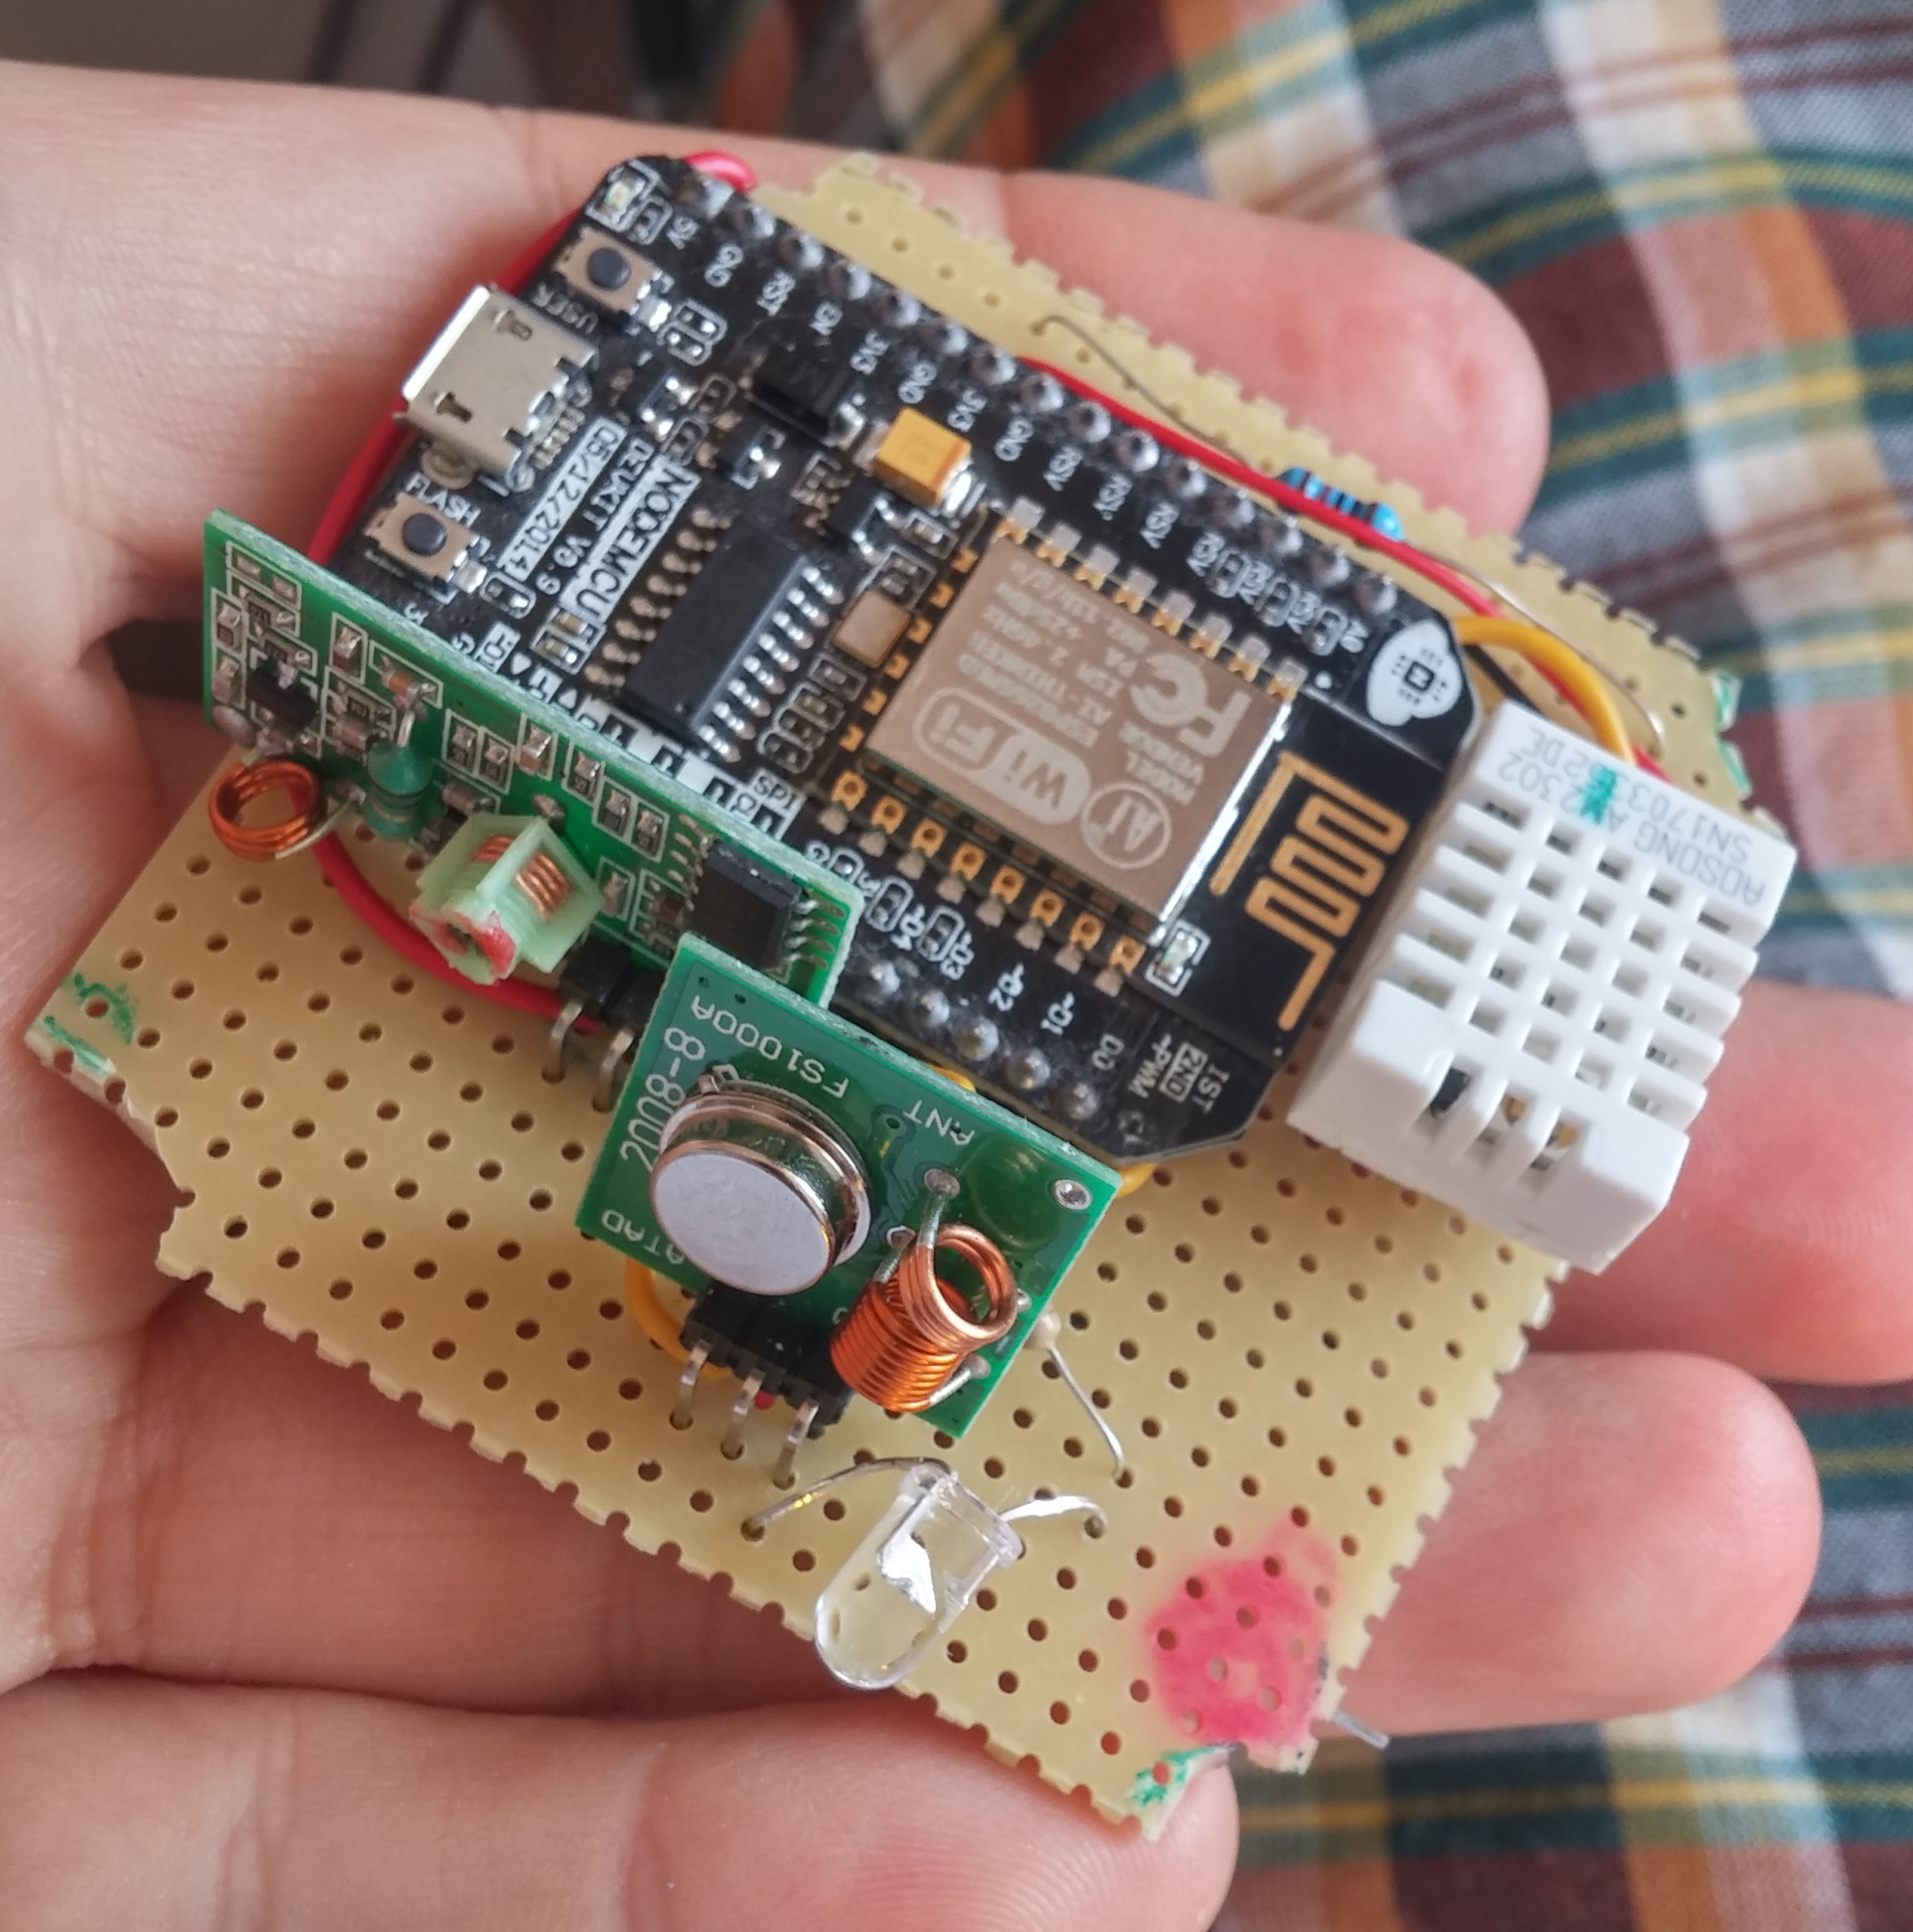 Hepek Iot A Hub For 01 Ideaand Proof Of Concept 433mhz Receiver Circuit Esp8266 Copy Gallery